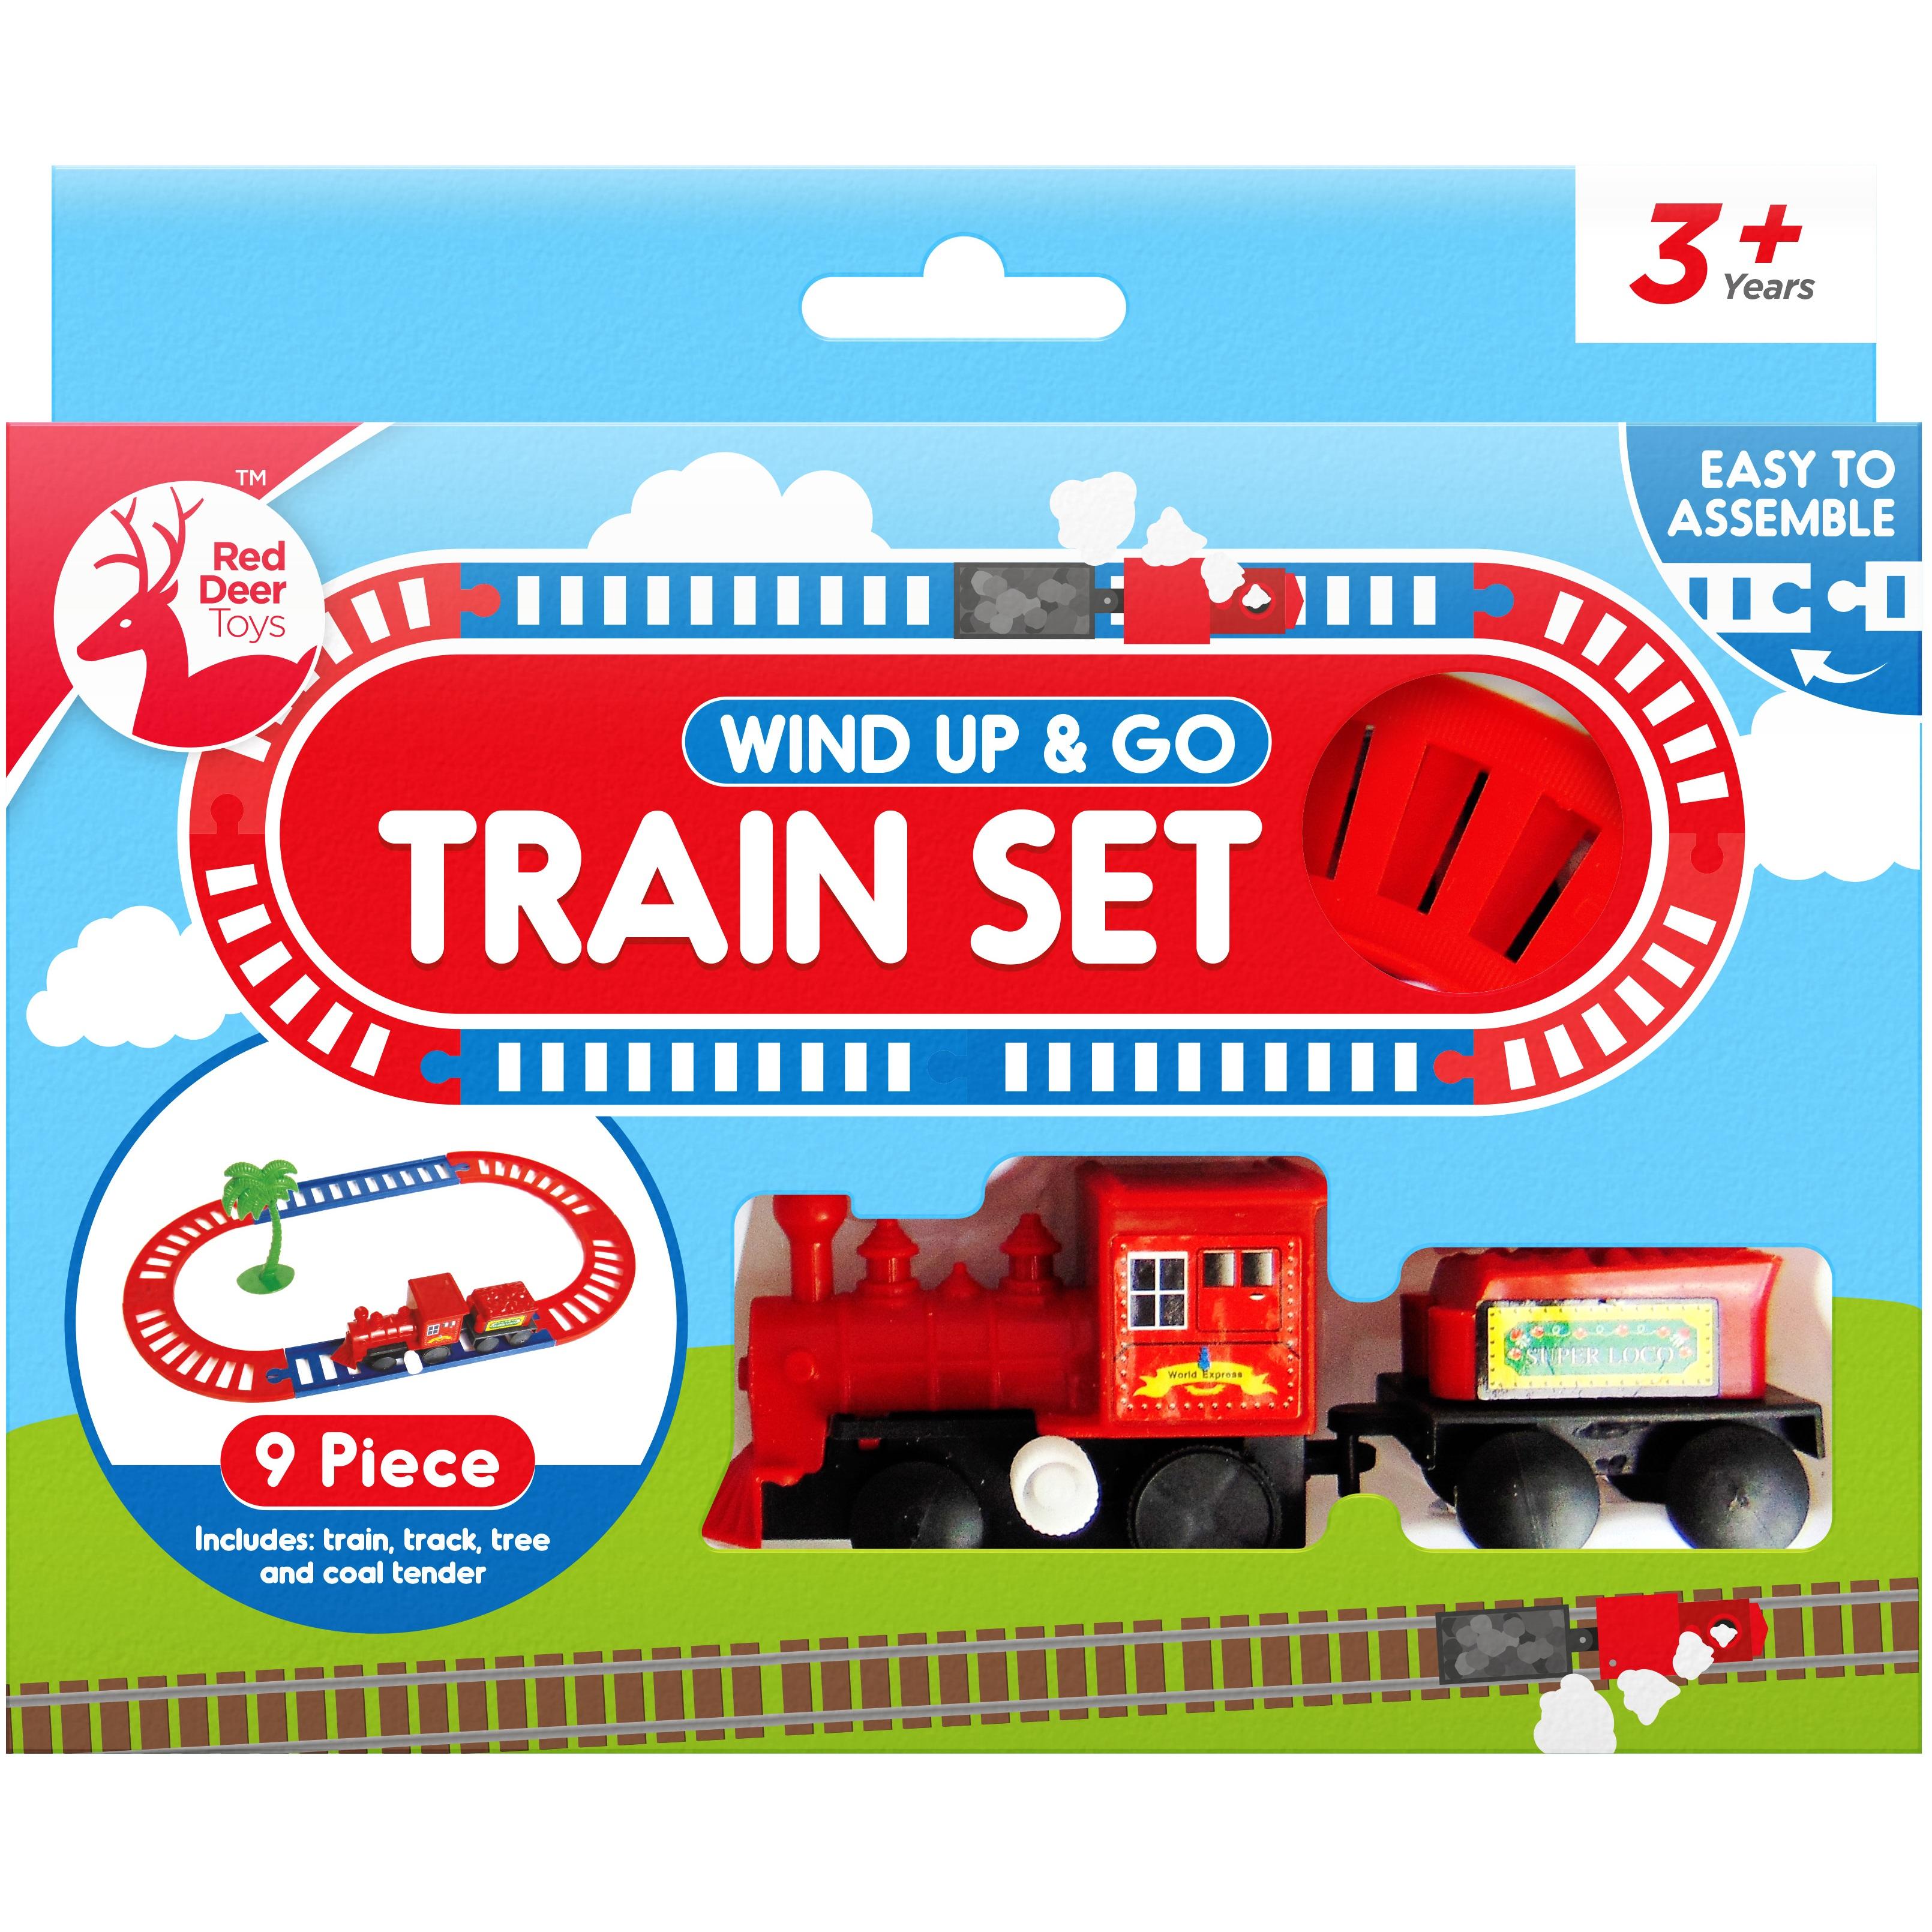 TRAIN TRACK SET WIND UP Toy Kids Childrens Gift Railways Christmas Xmas